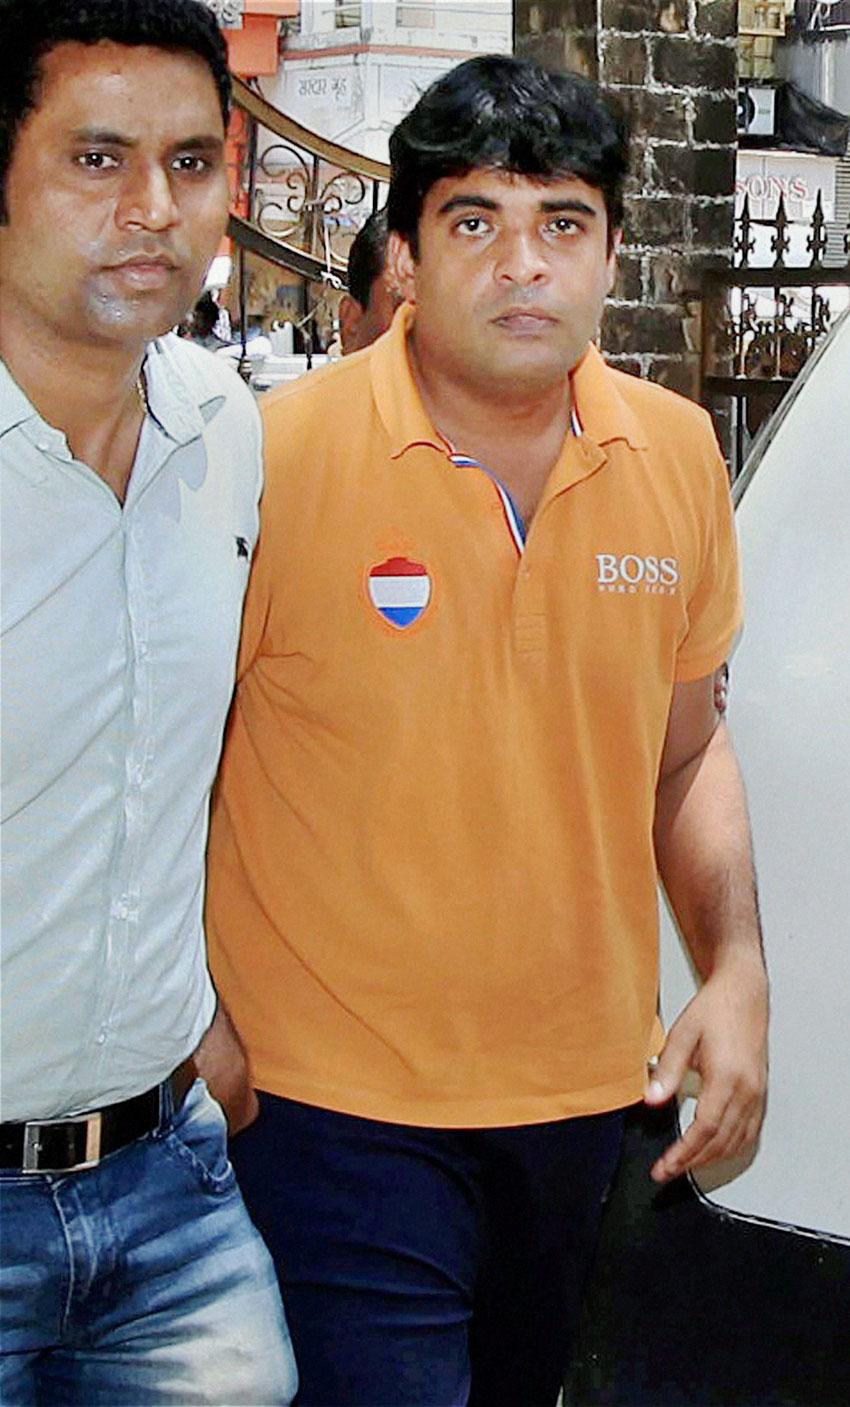 File photo of Chennai Super Kings' official Gurunath Meiyappan. (Press Trust of India)